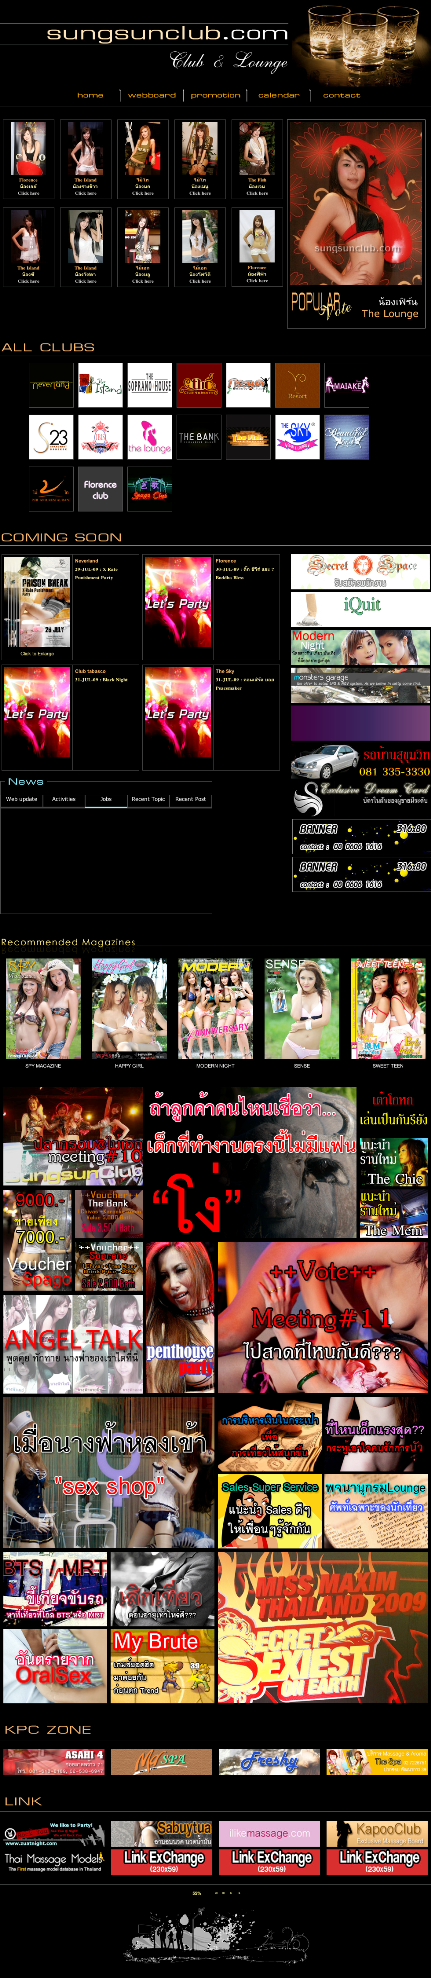 20090725_061811_wwwsungsunclubcom_p_980.png